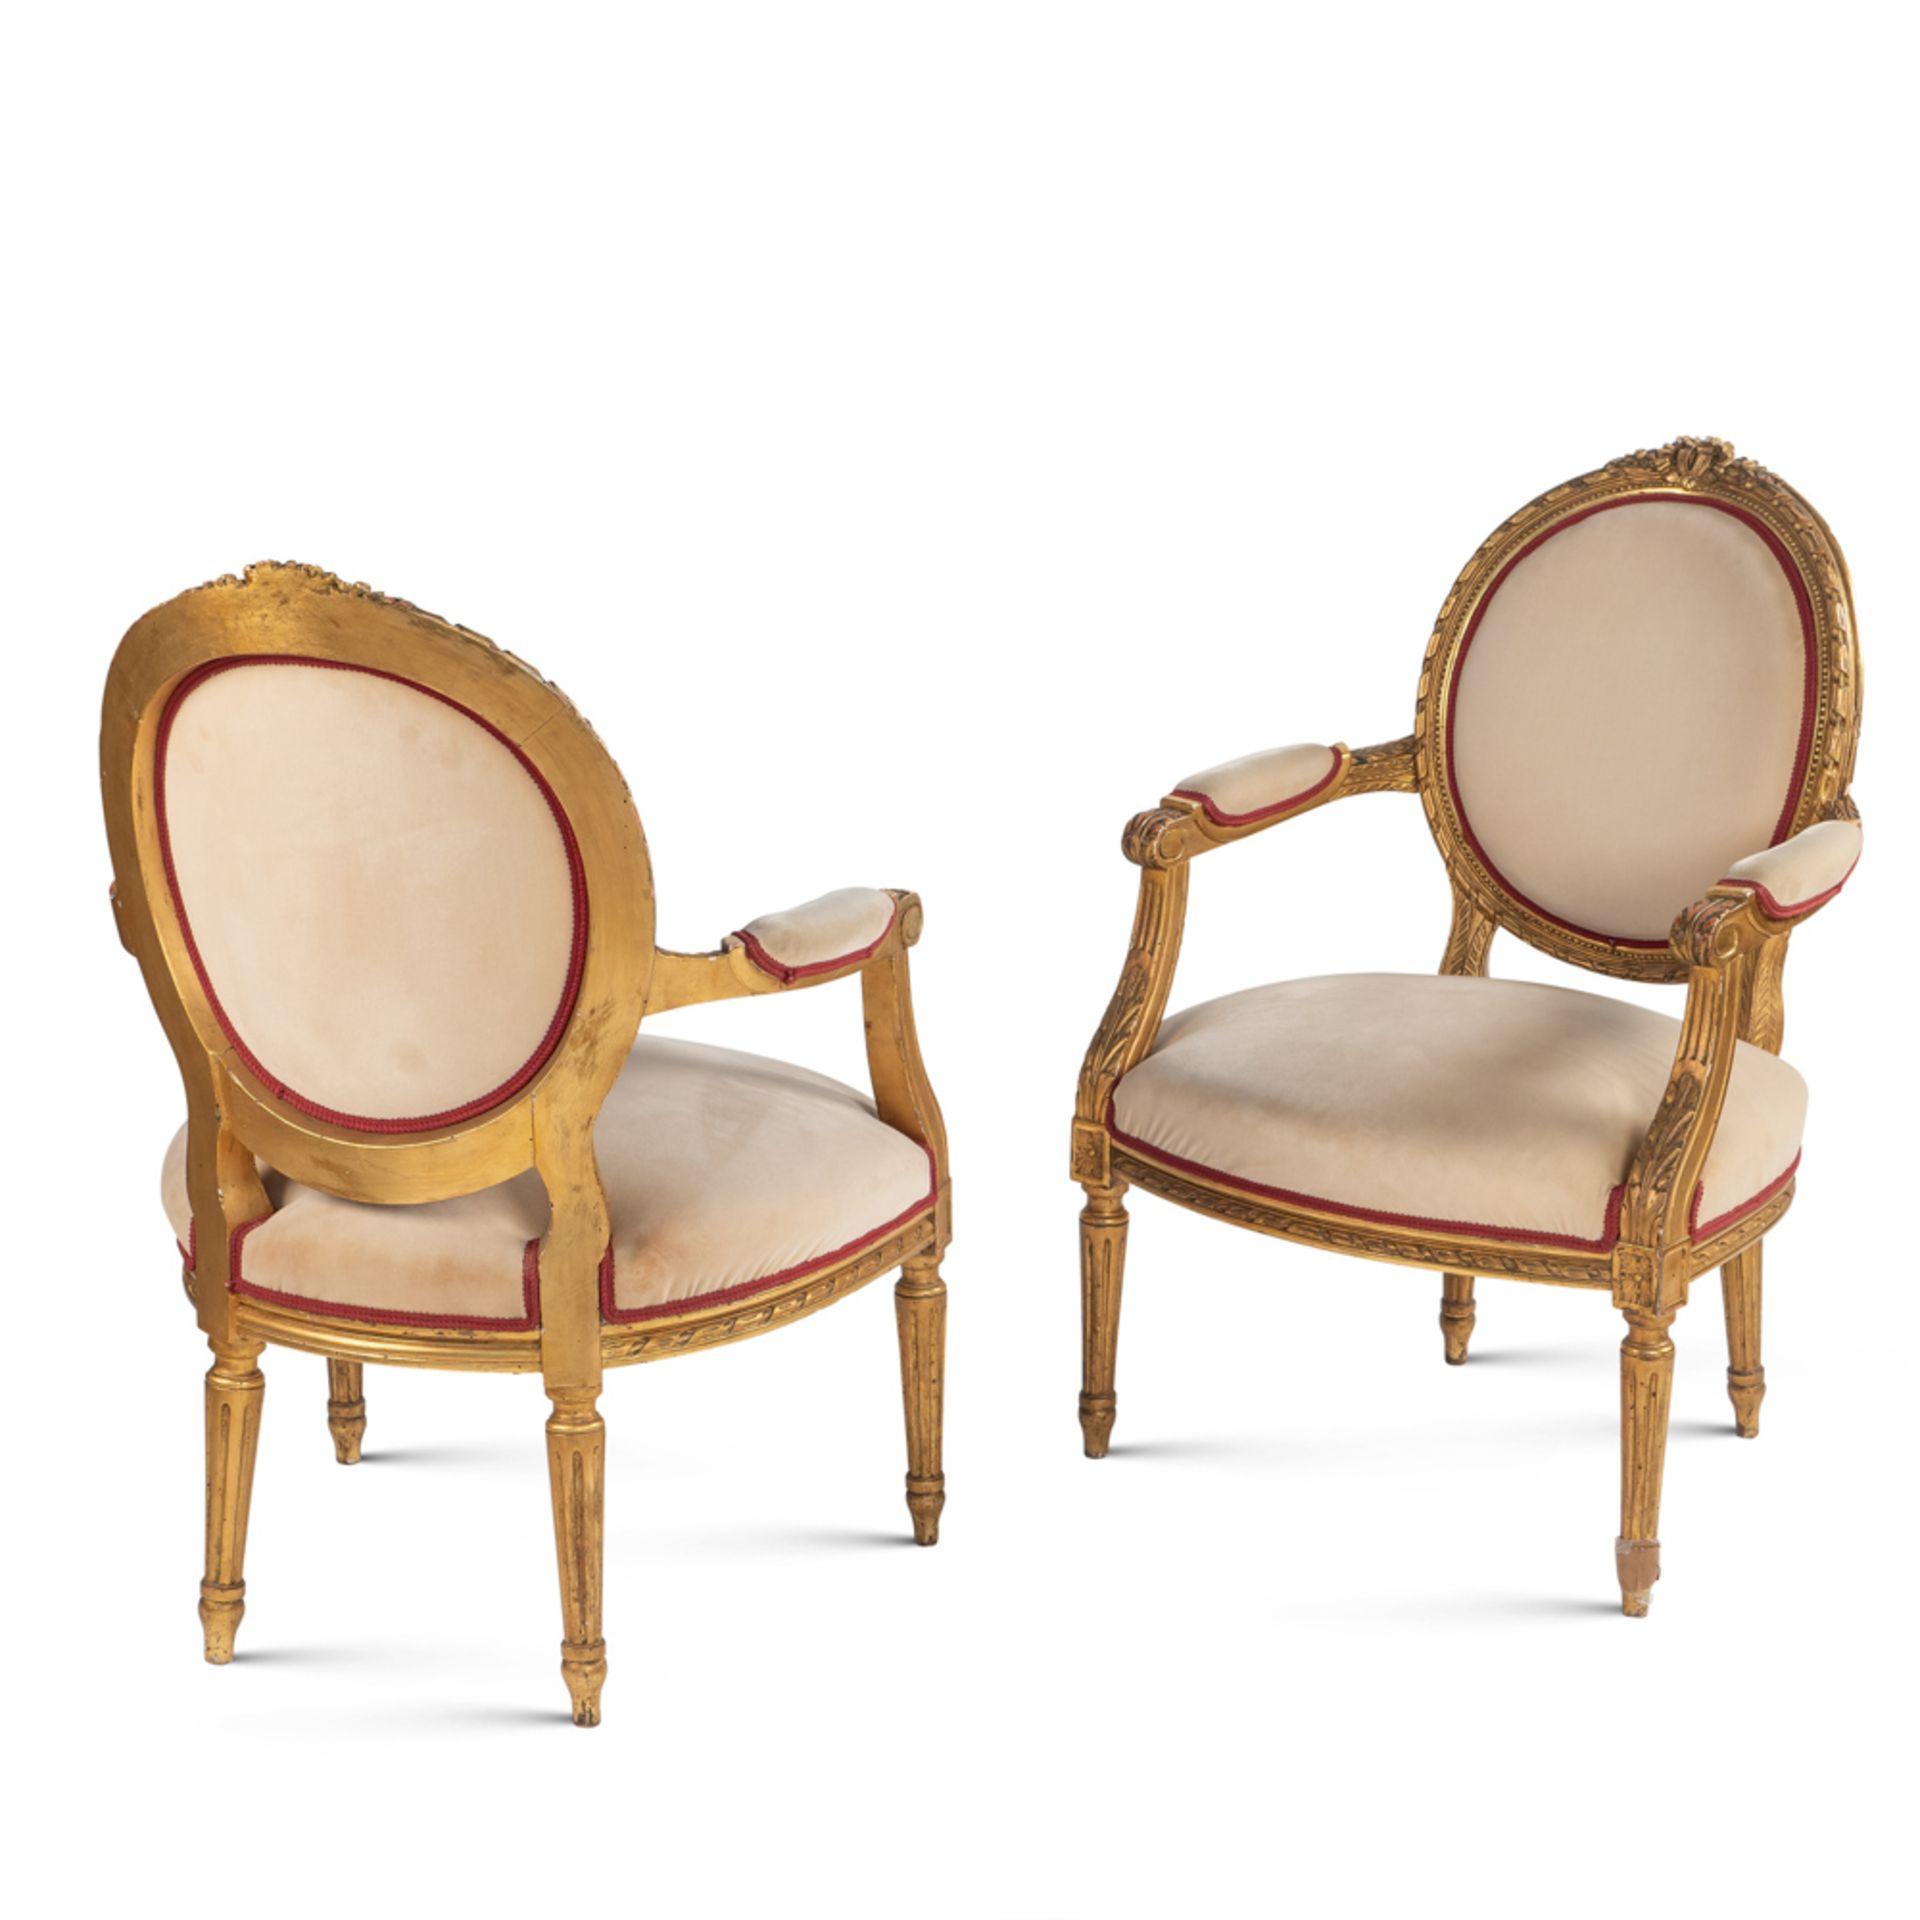 Pair of gilt wood armchairs France, 19th-20th century 83x63x56 cm.